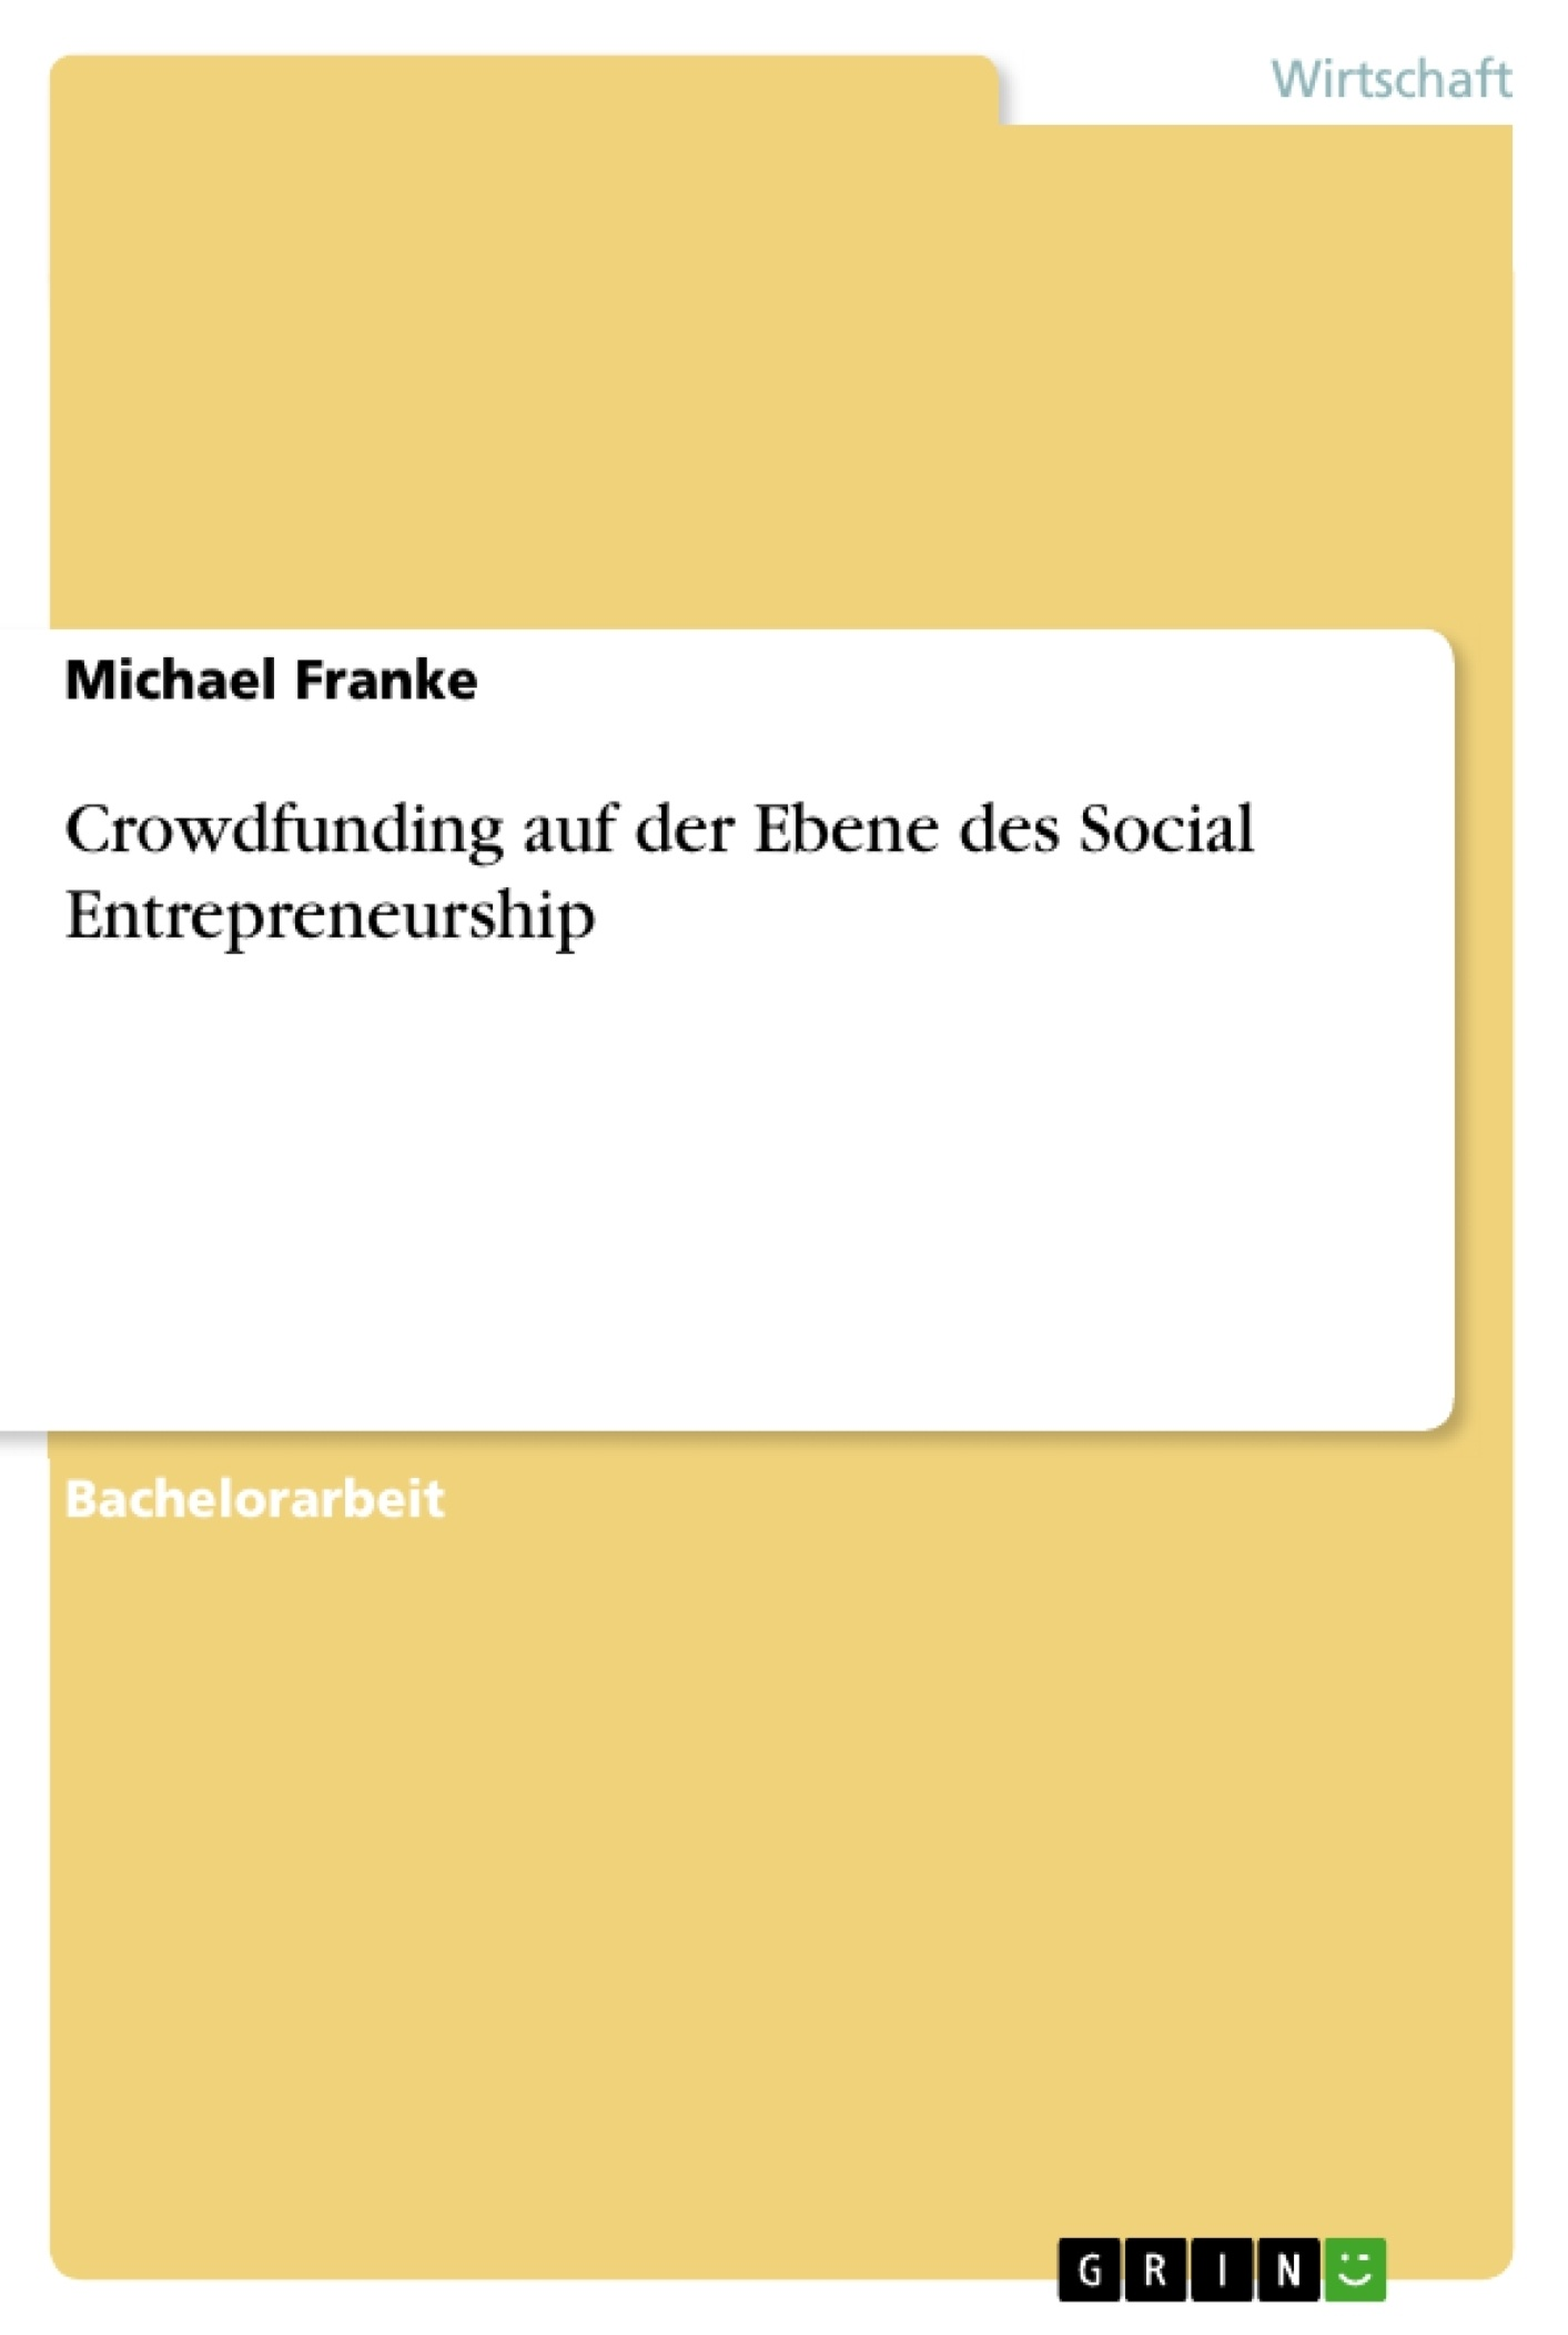 Titel: Crowdfunding auf der Ebene des Social Entrepreneurship